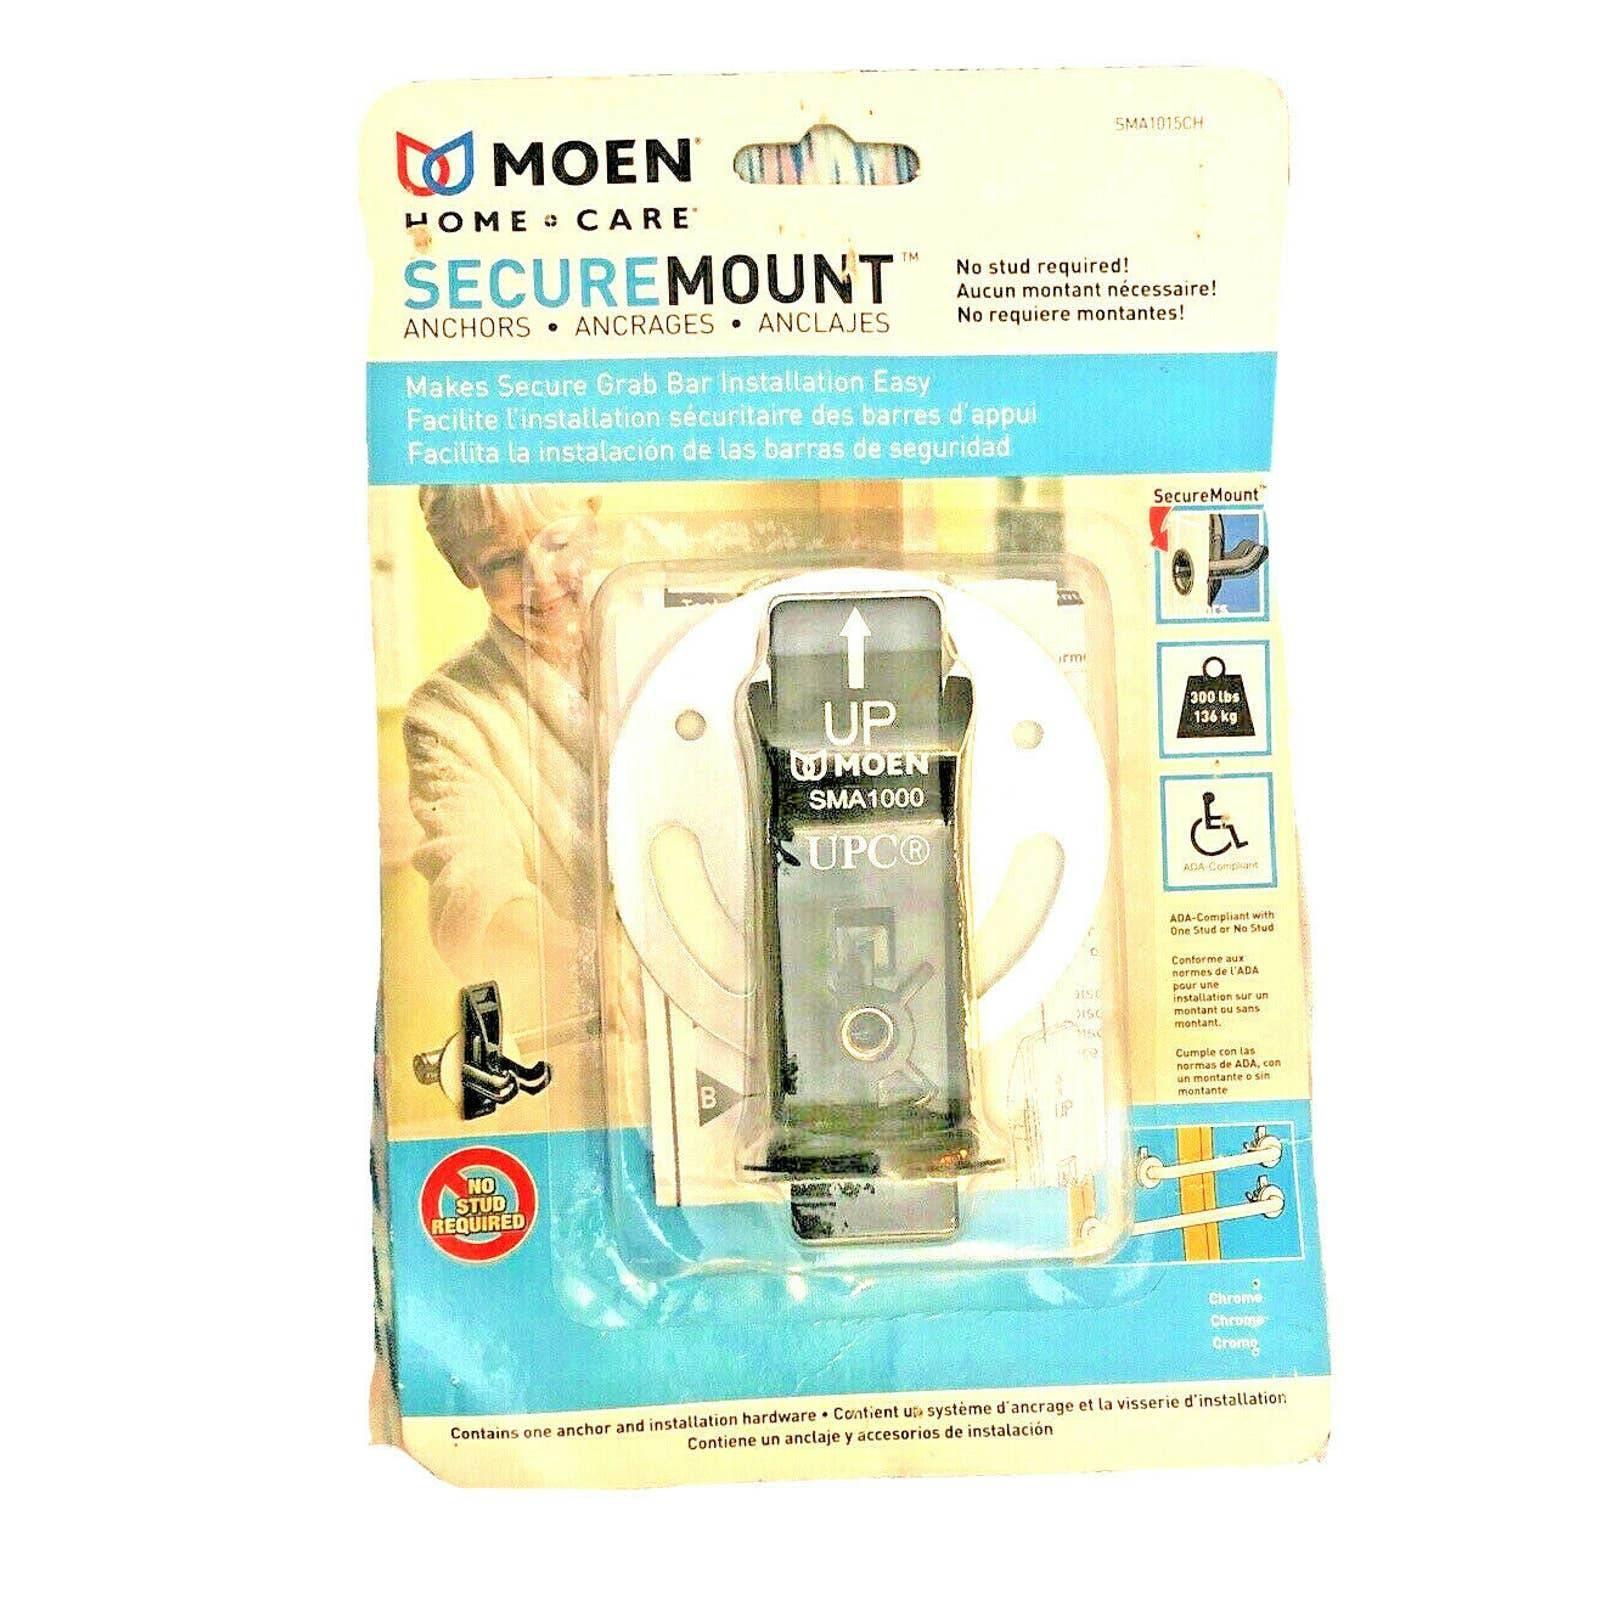 MOEN SMA1015CH Grab Bar Secure-mount SS